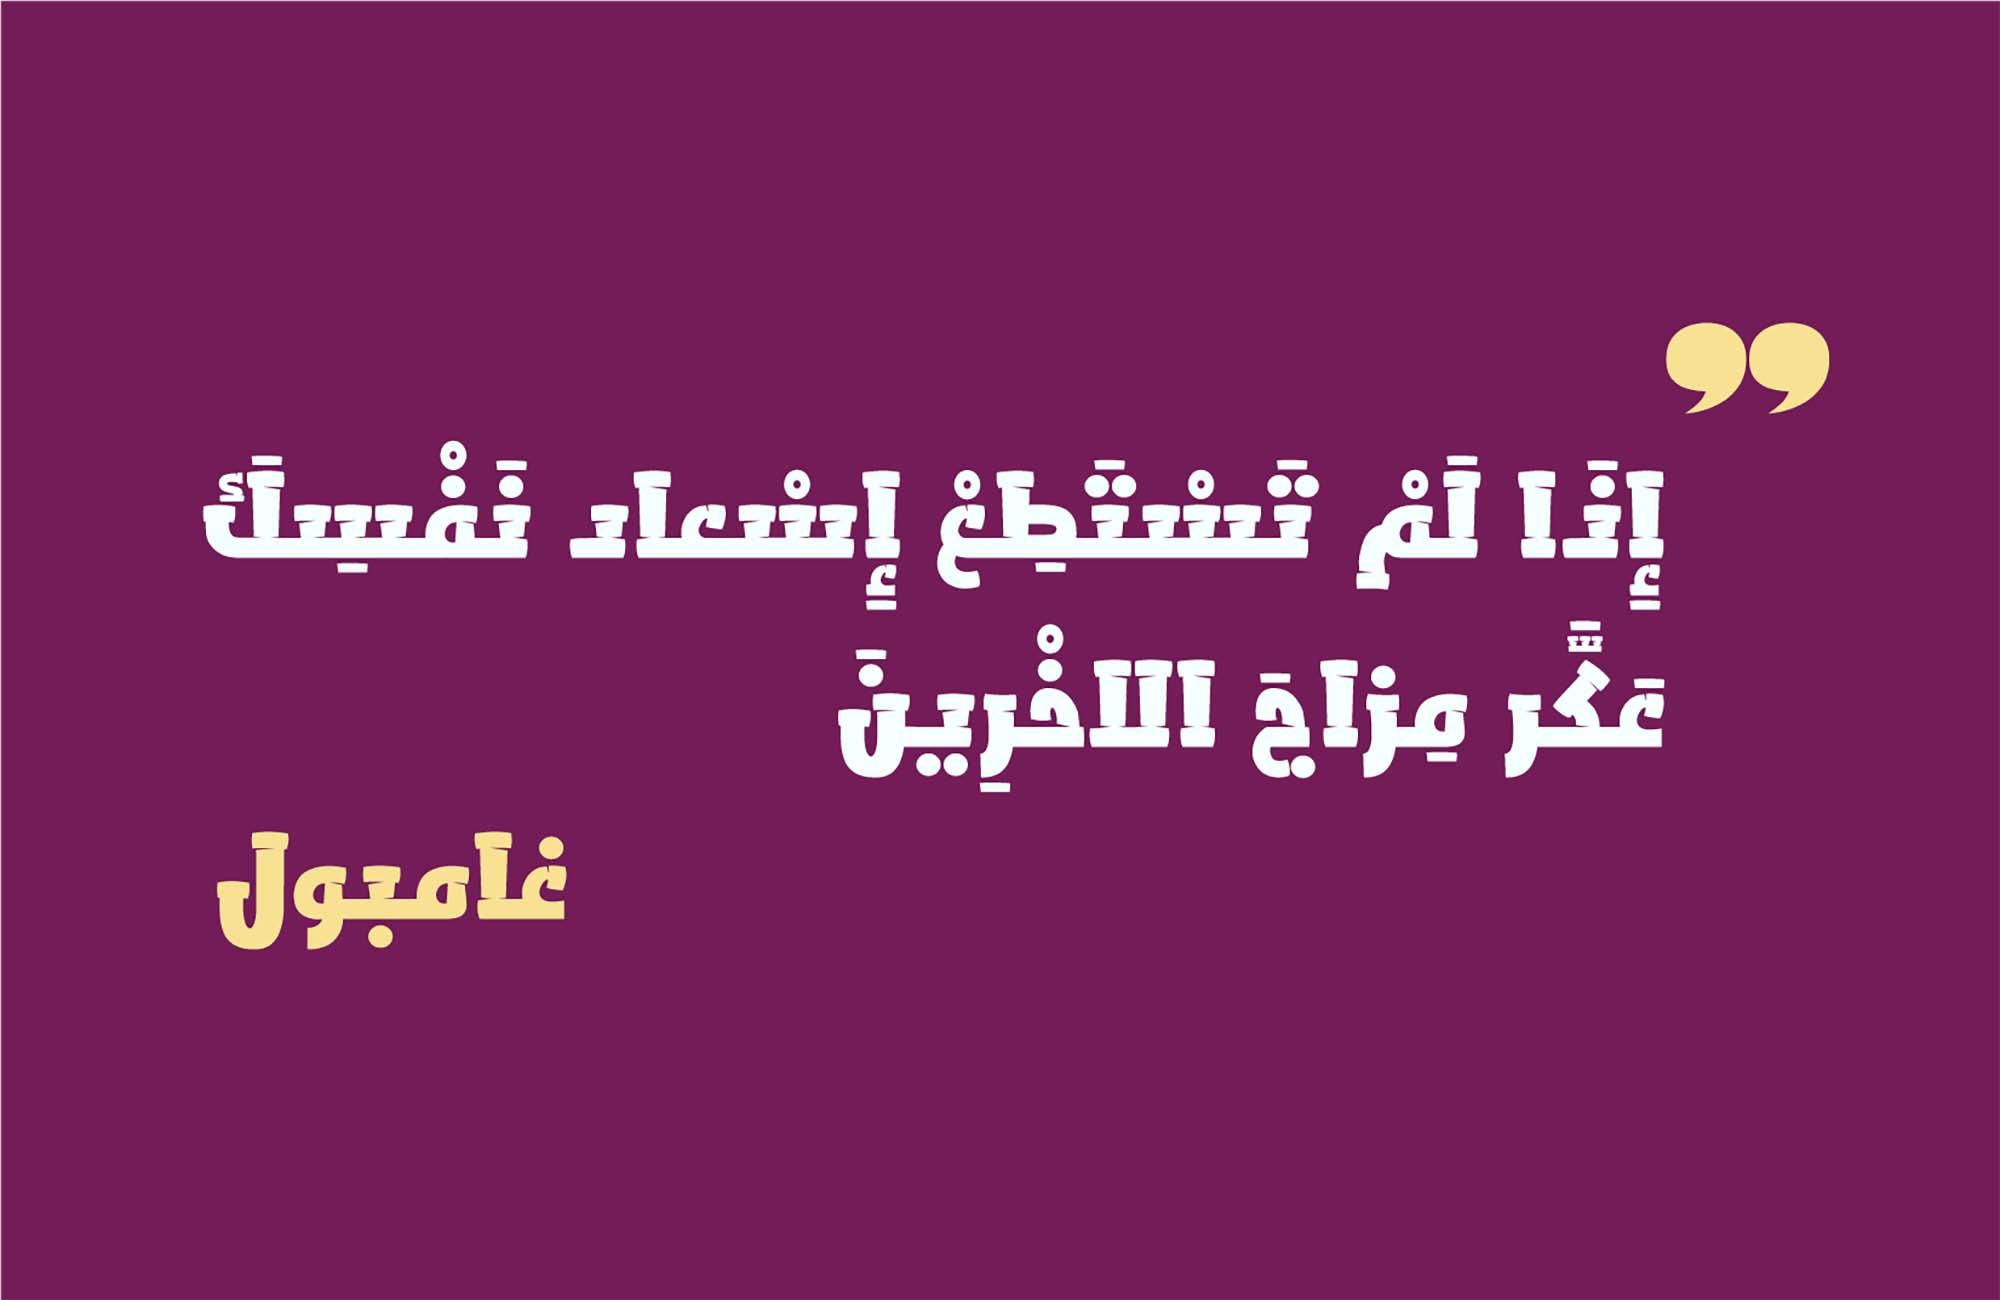 TS Split Arabic Typeface 7